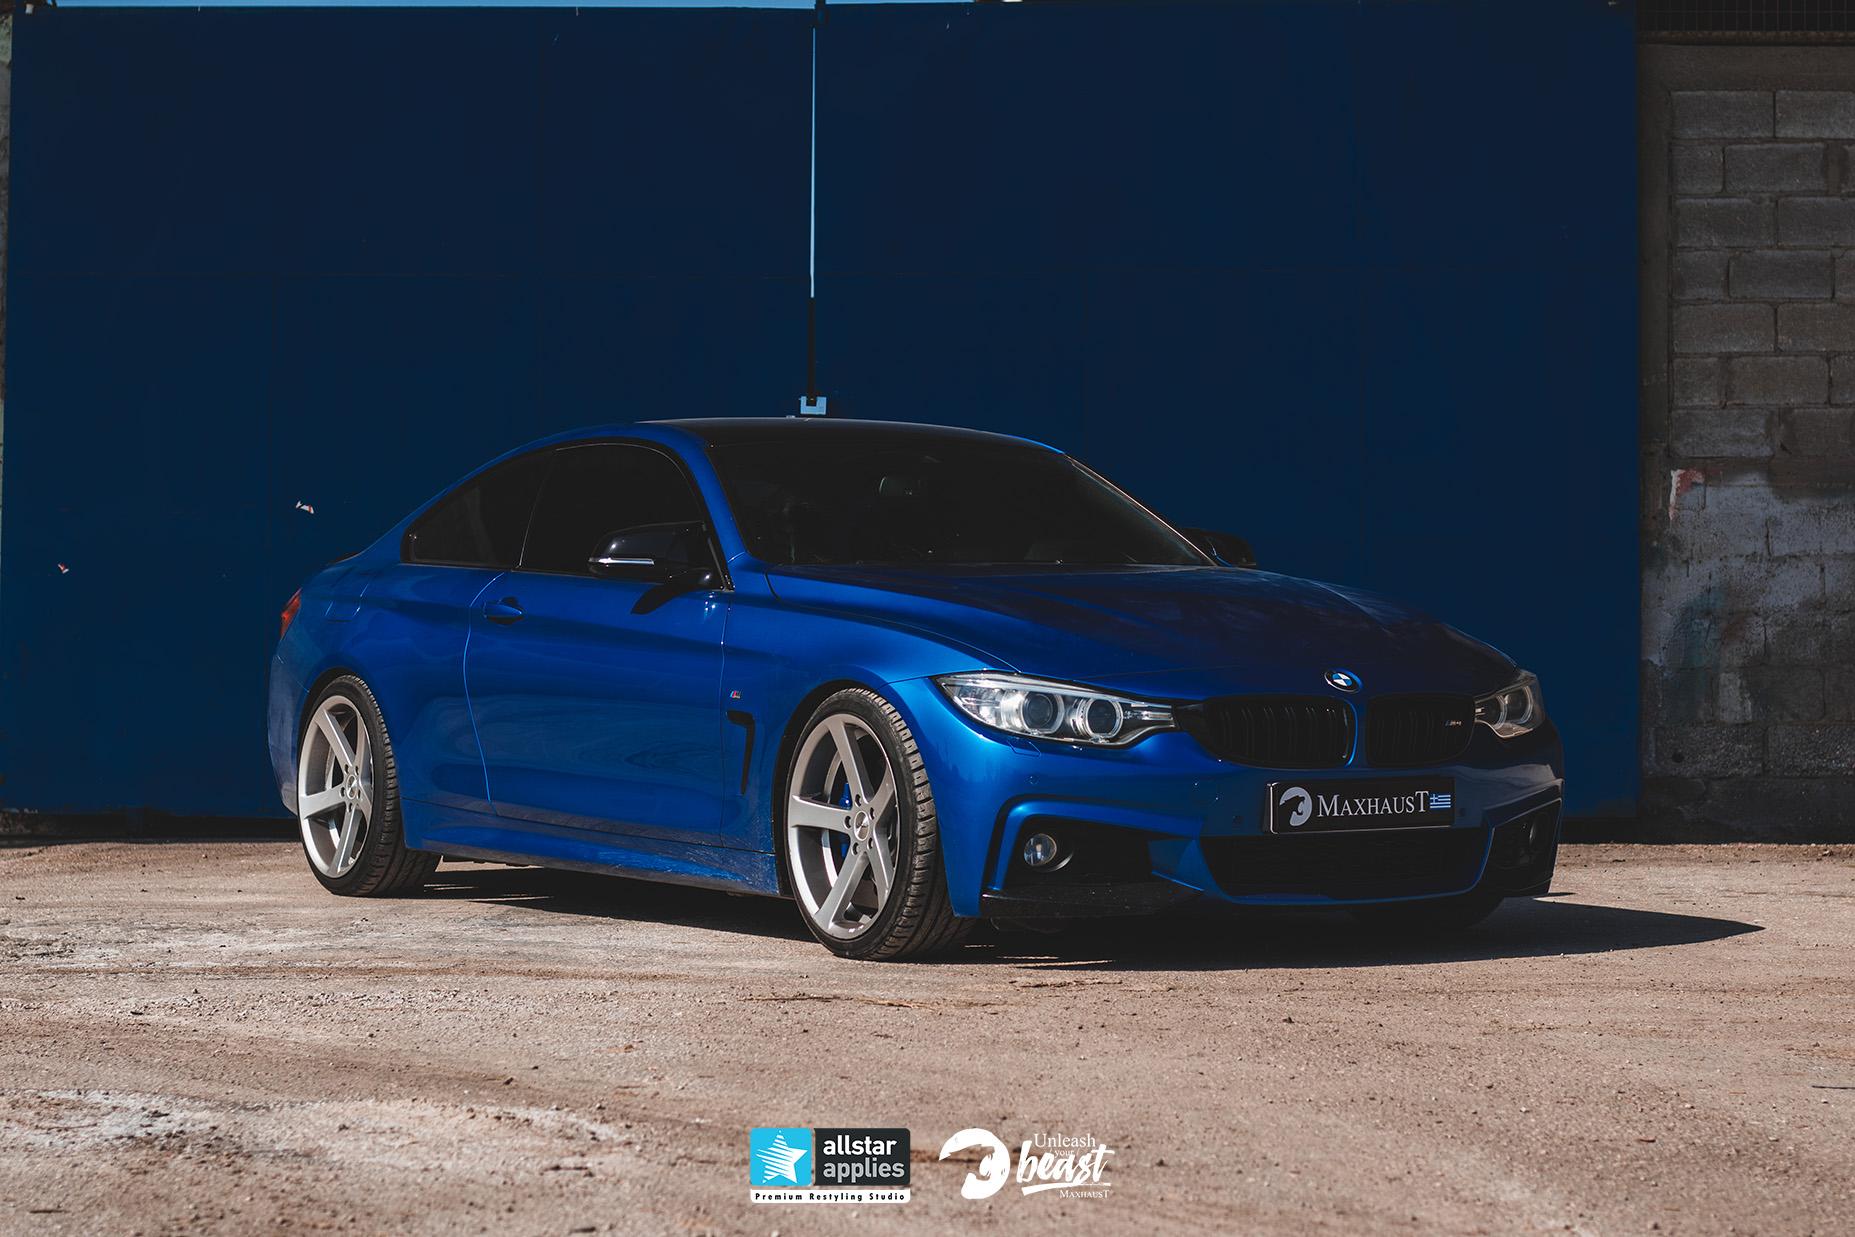 BMW MAXHAUST M4 2